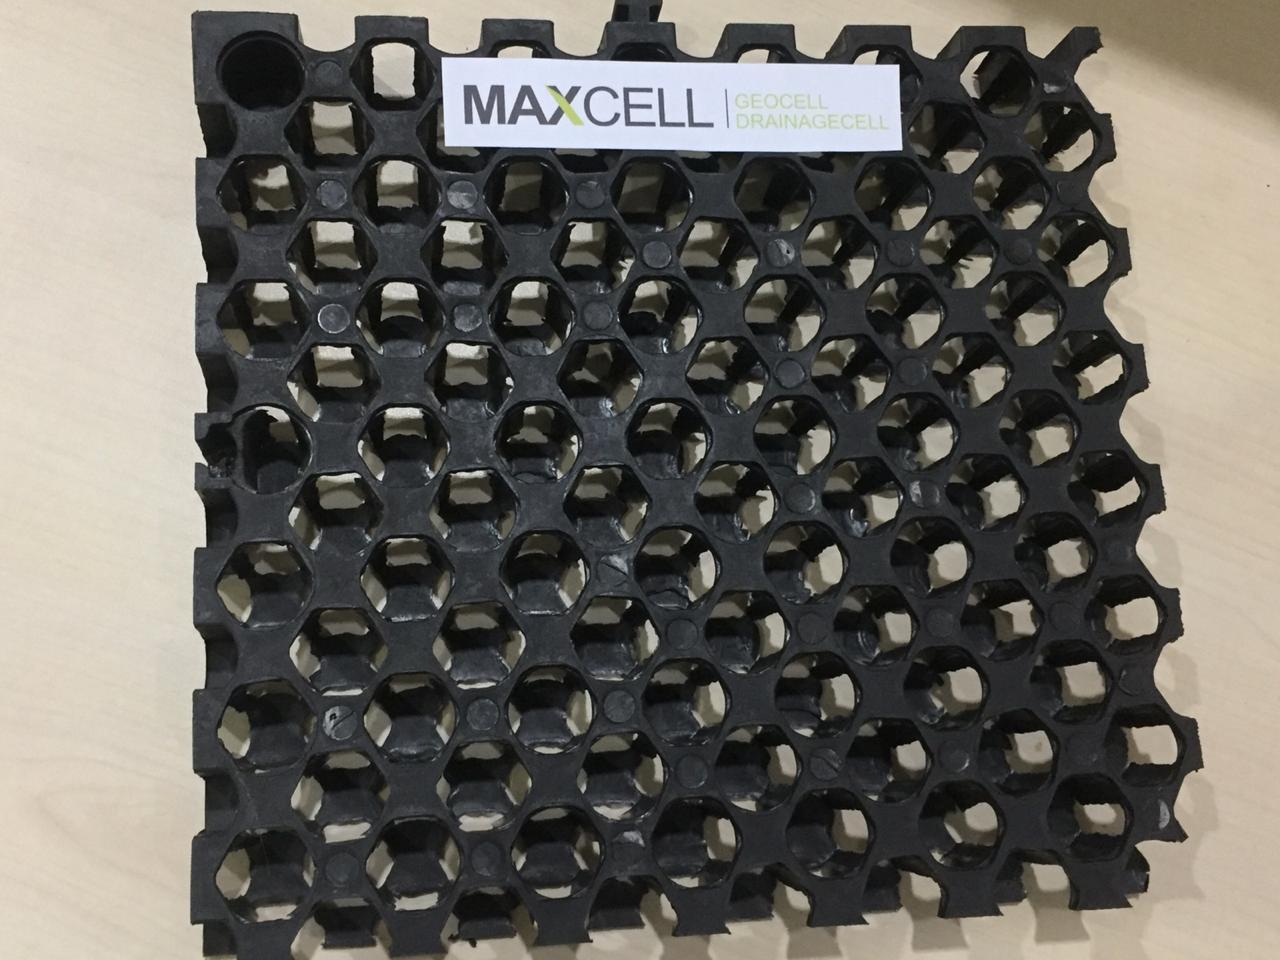 cari drainage cell berkualitas